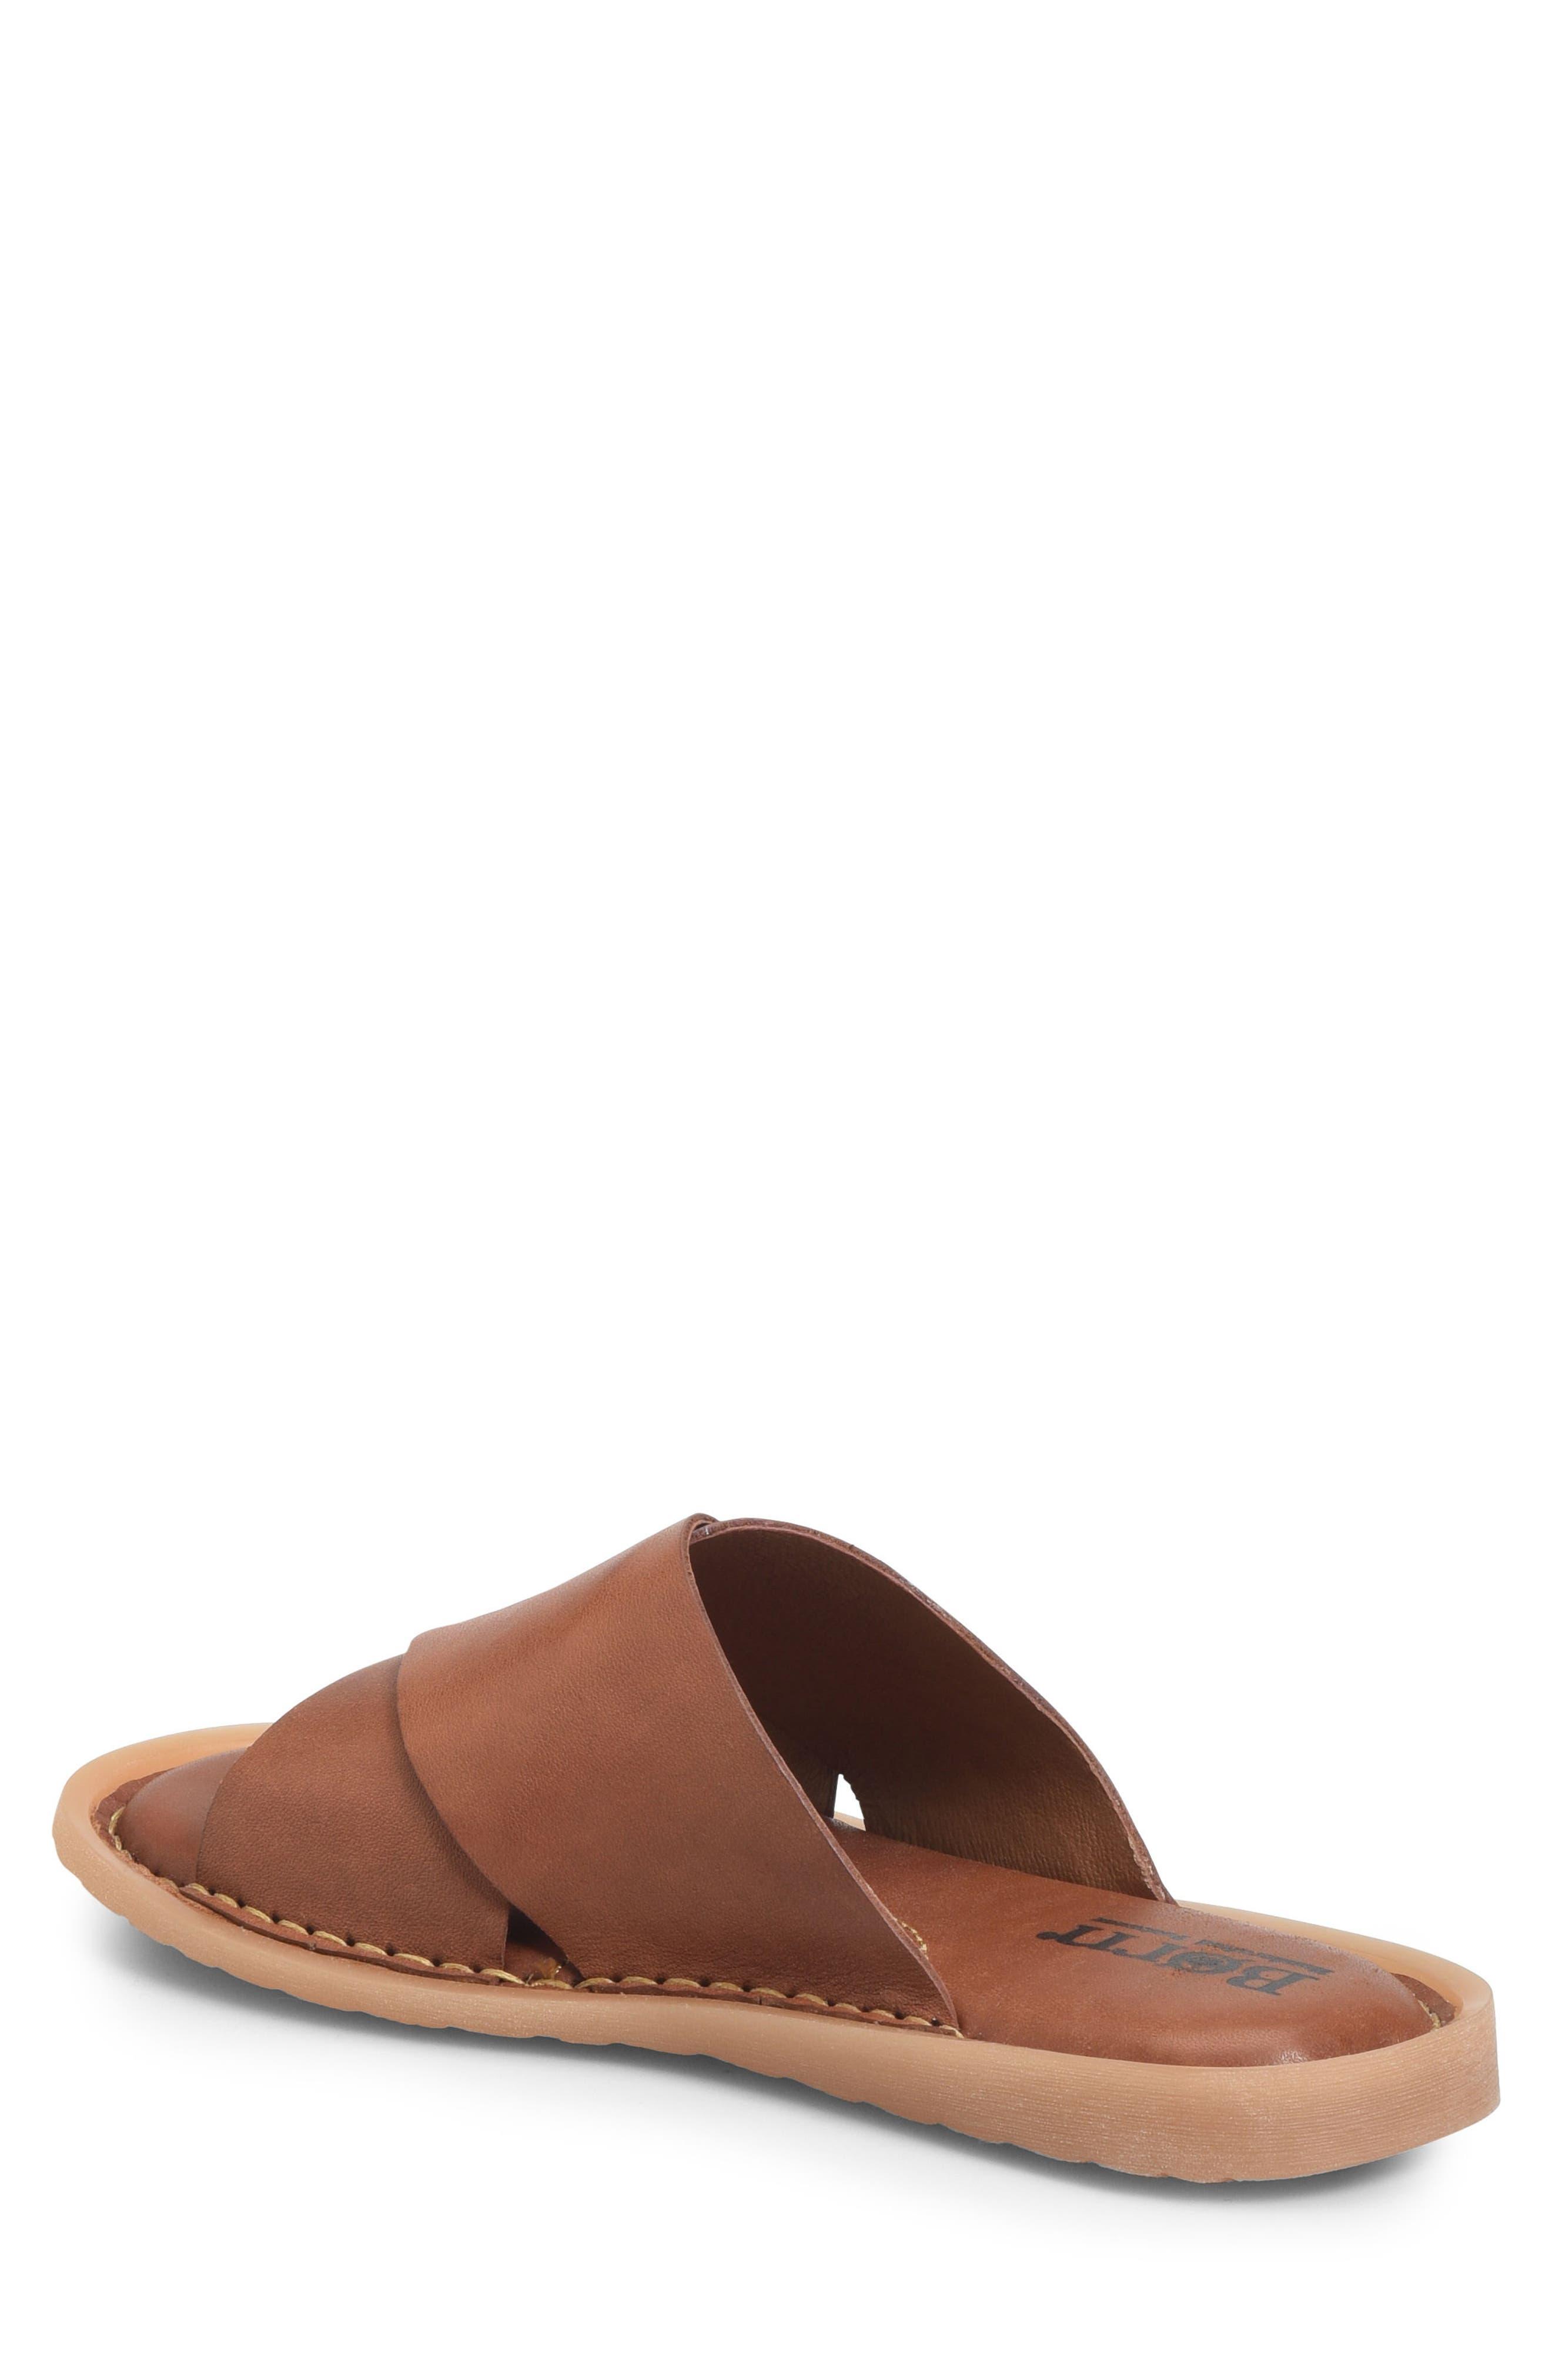 Getaway Slide Sandal,                             Alternate thumbnail 2, color,                             Rust Leather